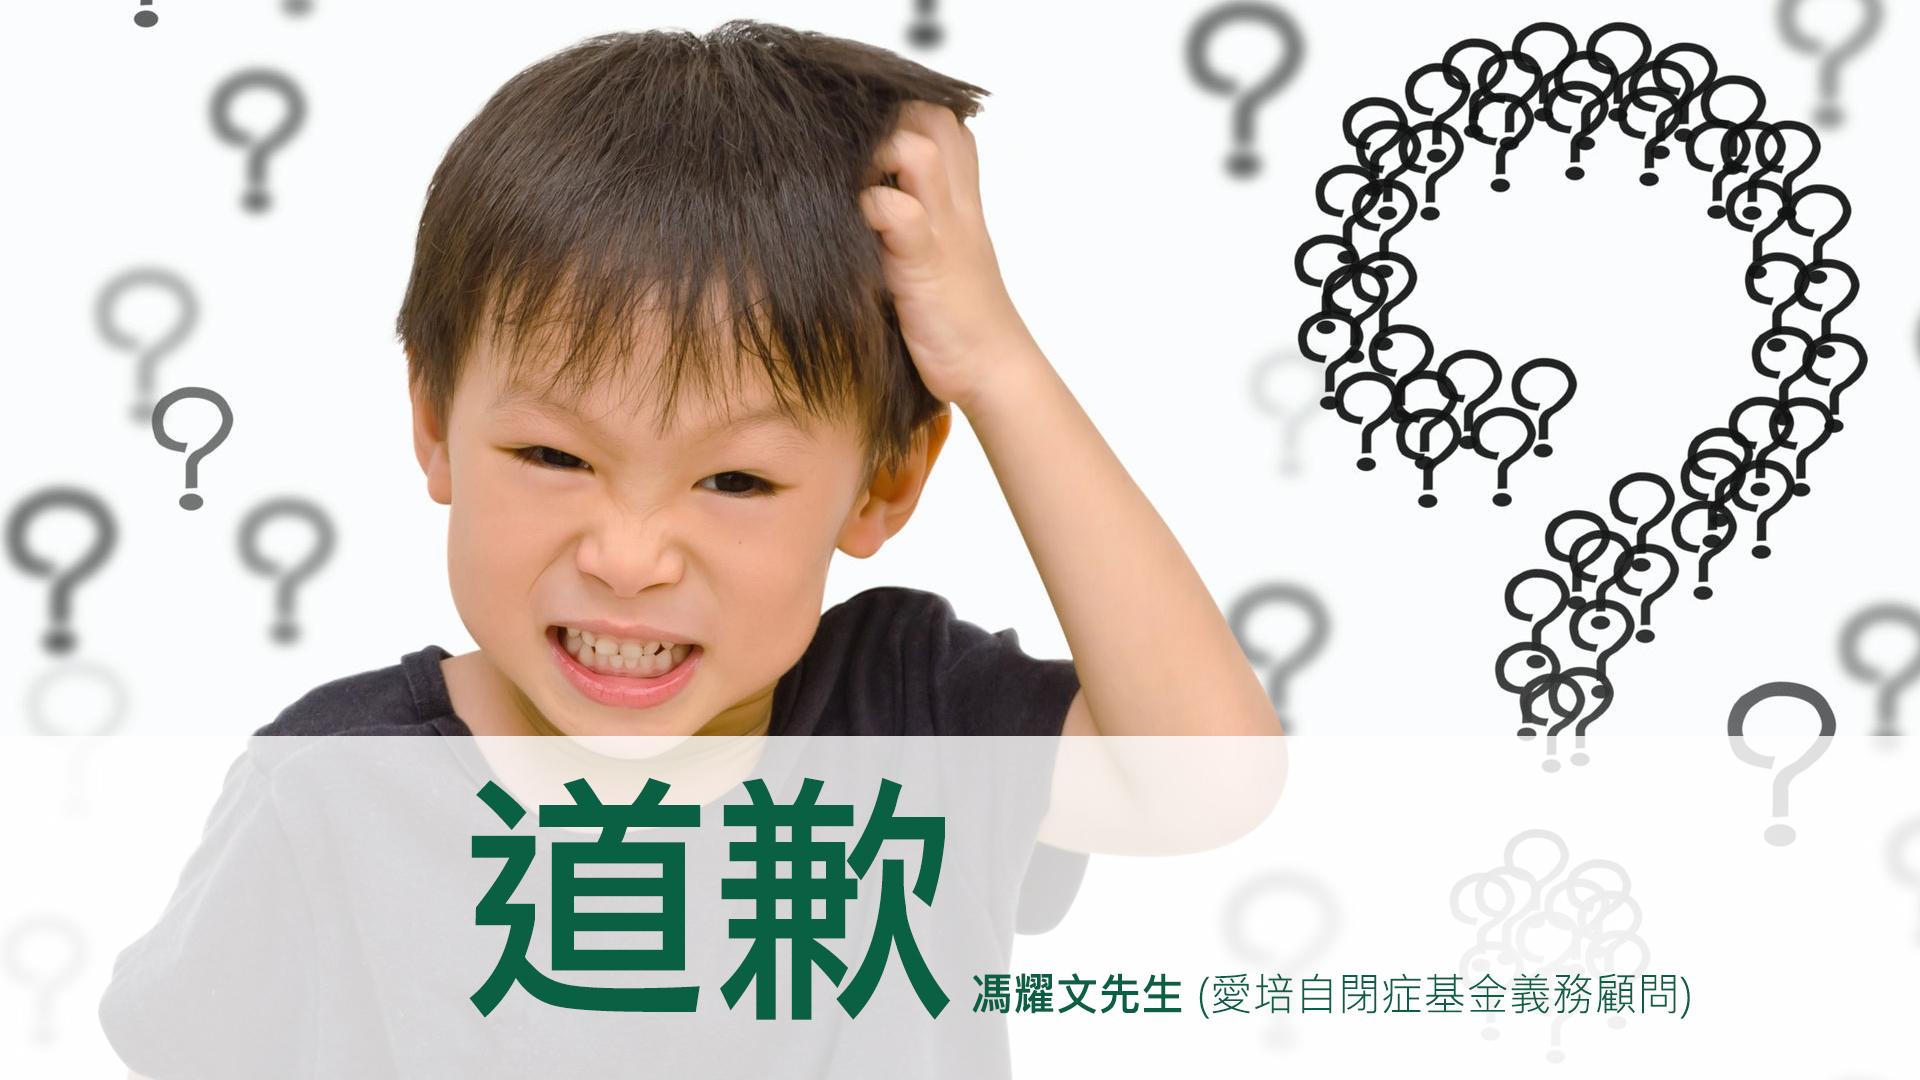 autismpartnership_article_raymond_how-to-teach-children-to-apologize